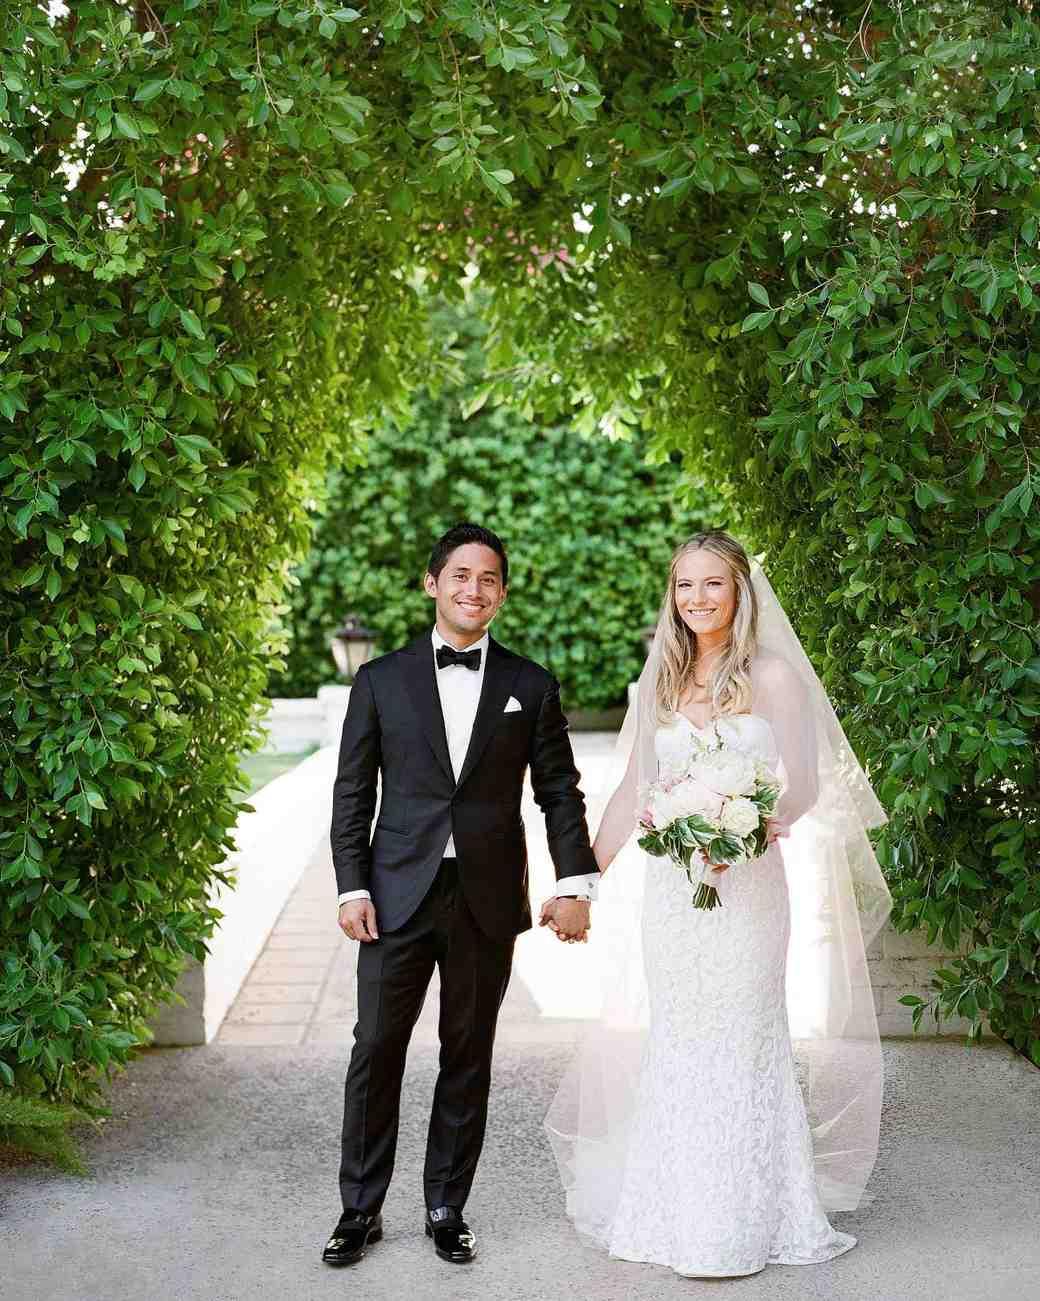 Outdoor Casual Wedding Dress